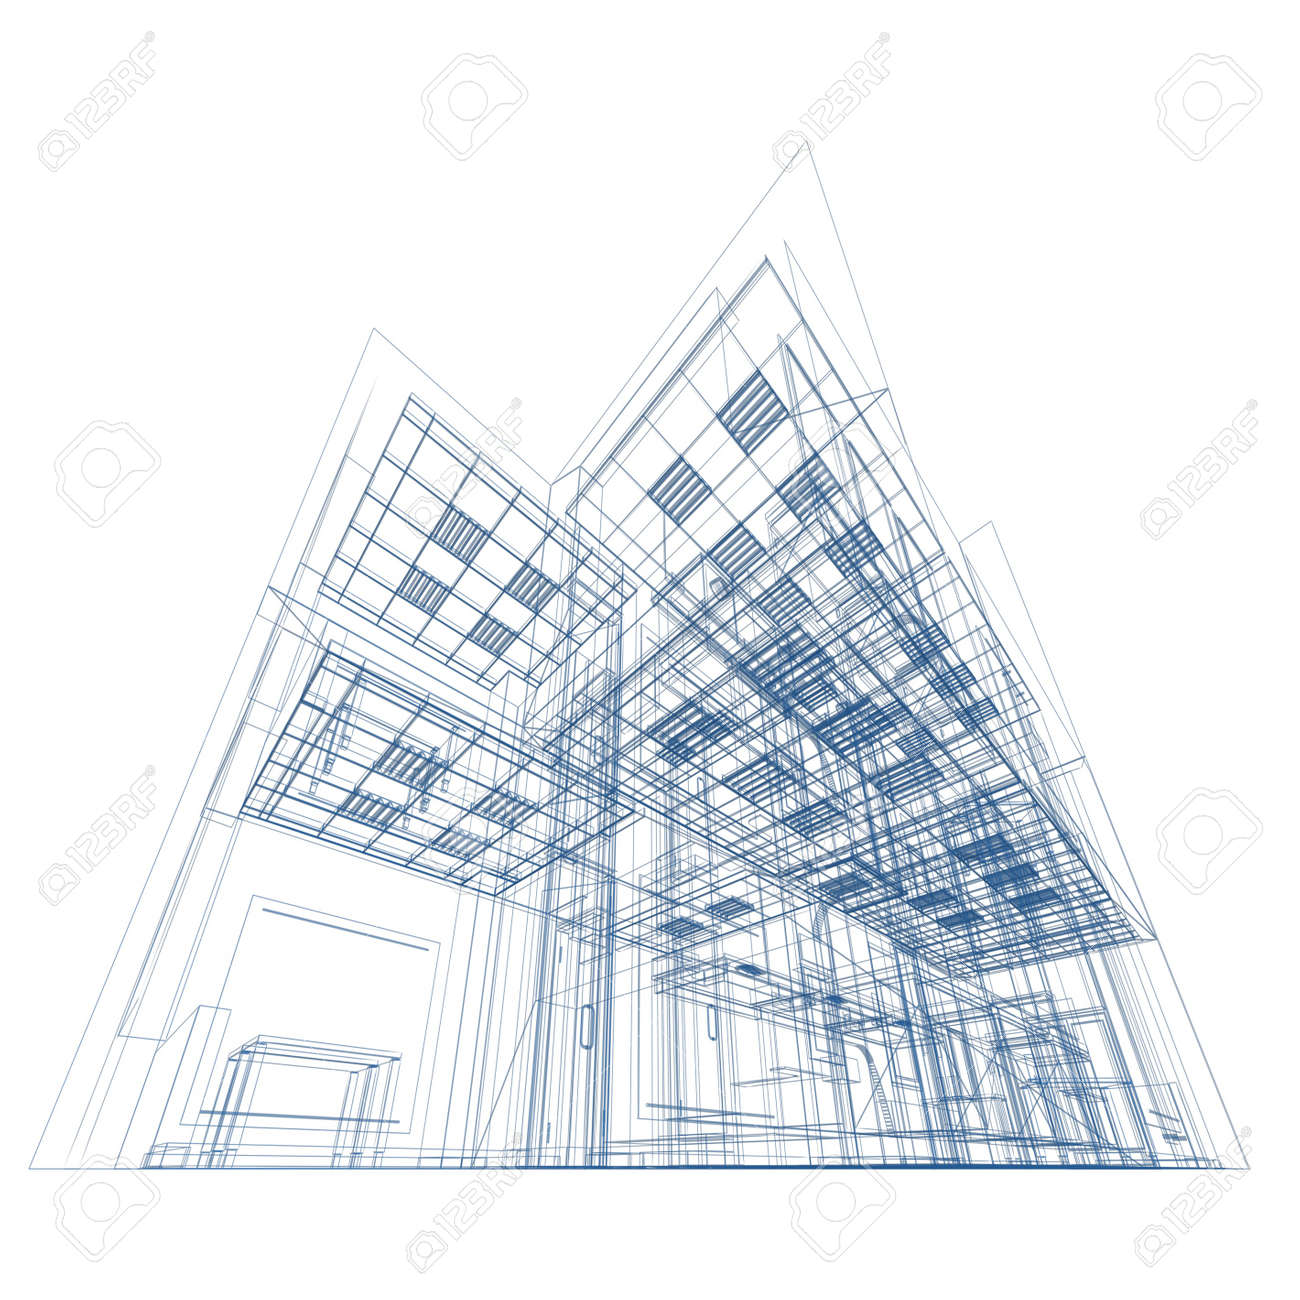 Blueprint on white conceptual architecture project stock photo blueprint on white conceptual architecture project stock photo 10529880 malvernweather Choice Image